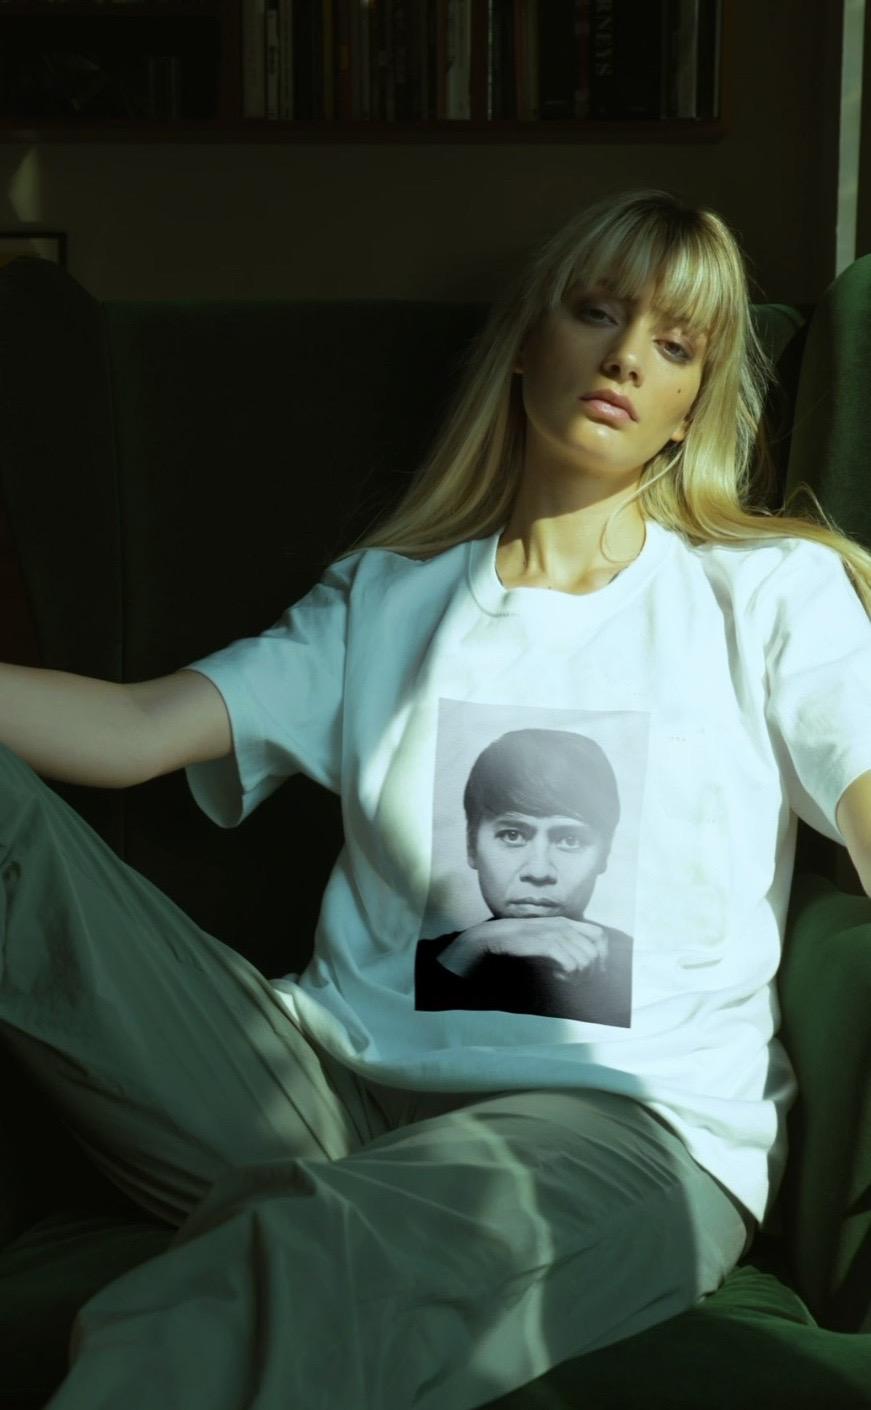 RHYME SO、アフターコロナの社会に向けた新曲をYouTubeに2曲同時公開サムネイル画像